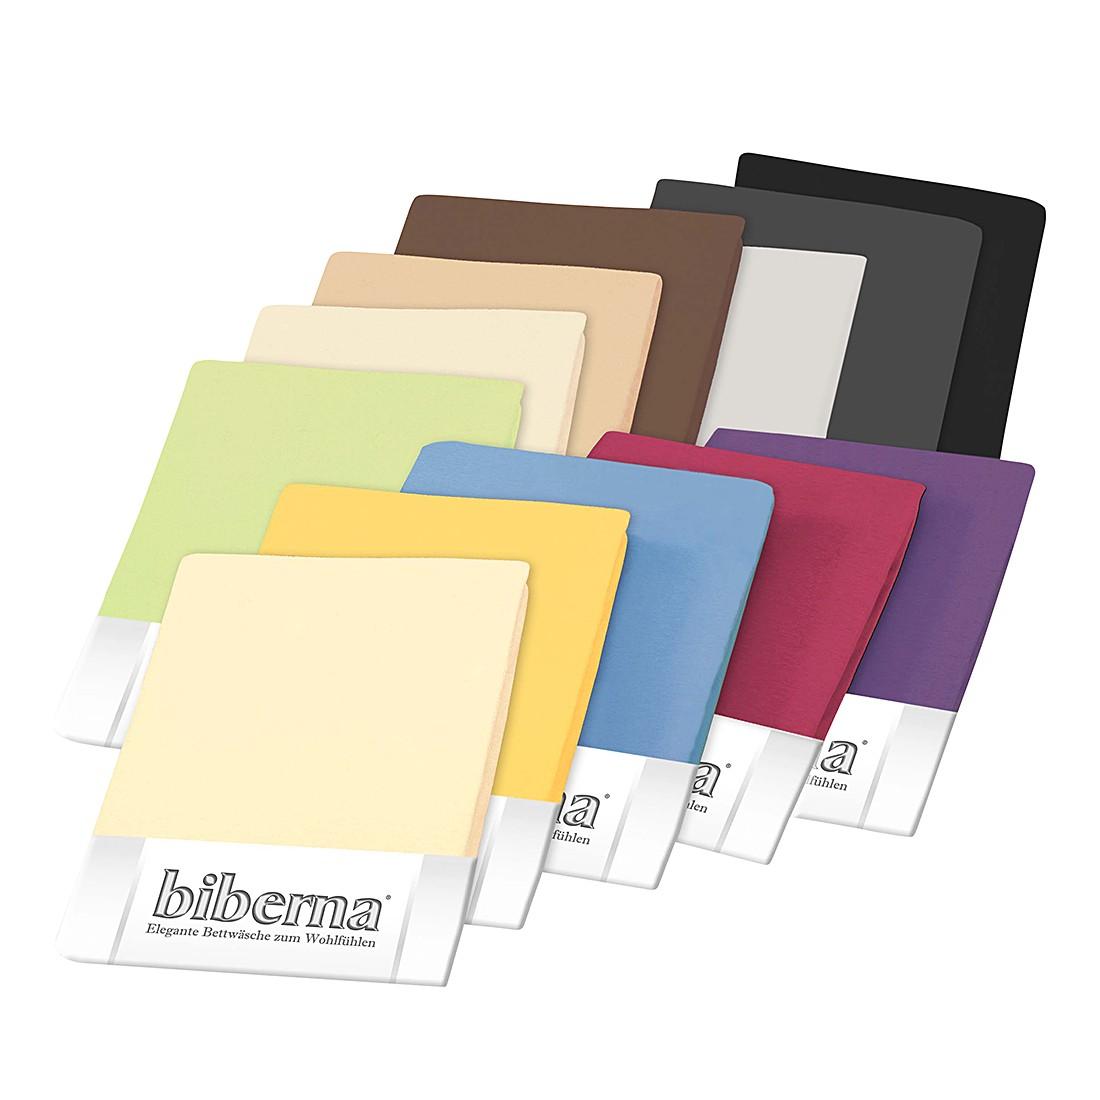 Jersey-Elastic-Boxspring Spannbetttuch – Gelb – 180-200 x 200-220 cm, Biberna jetzt bestellen